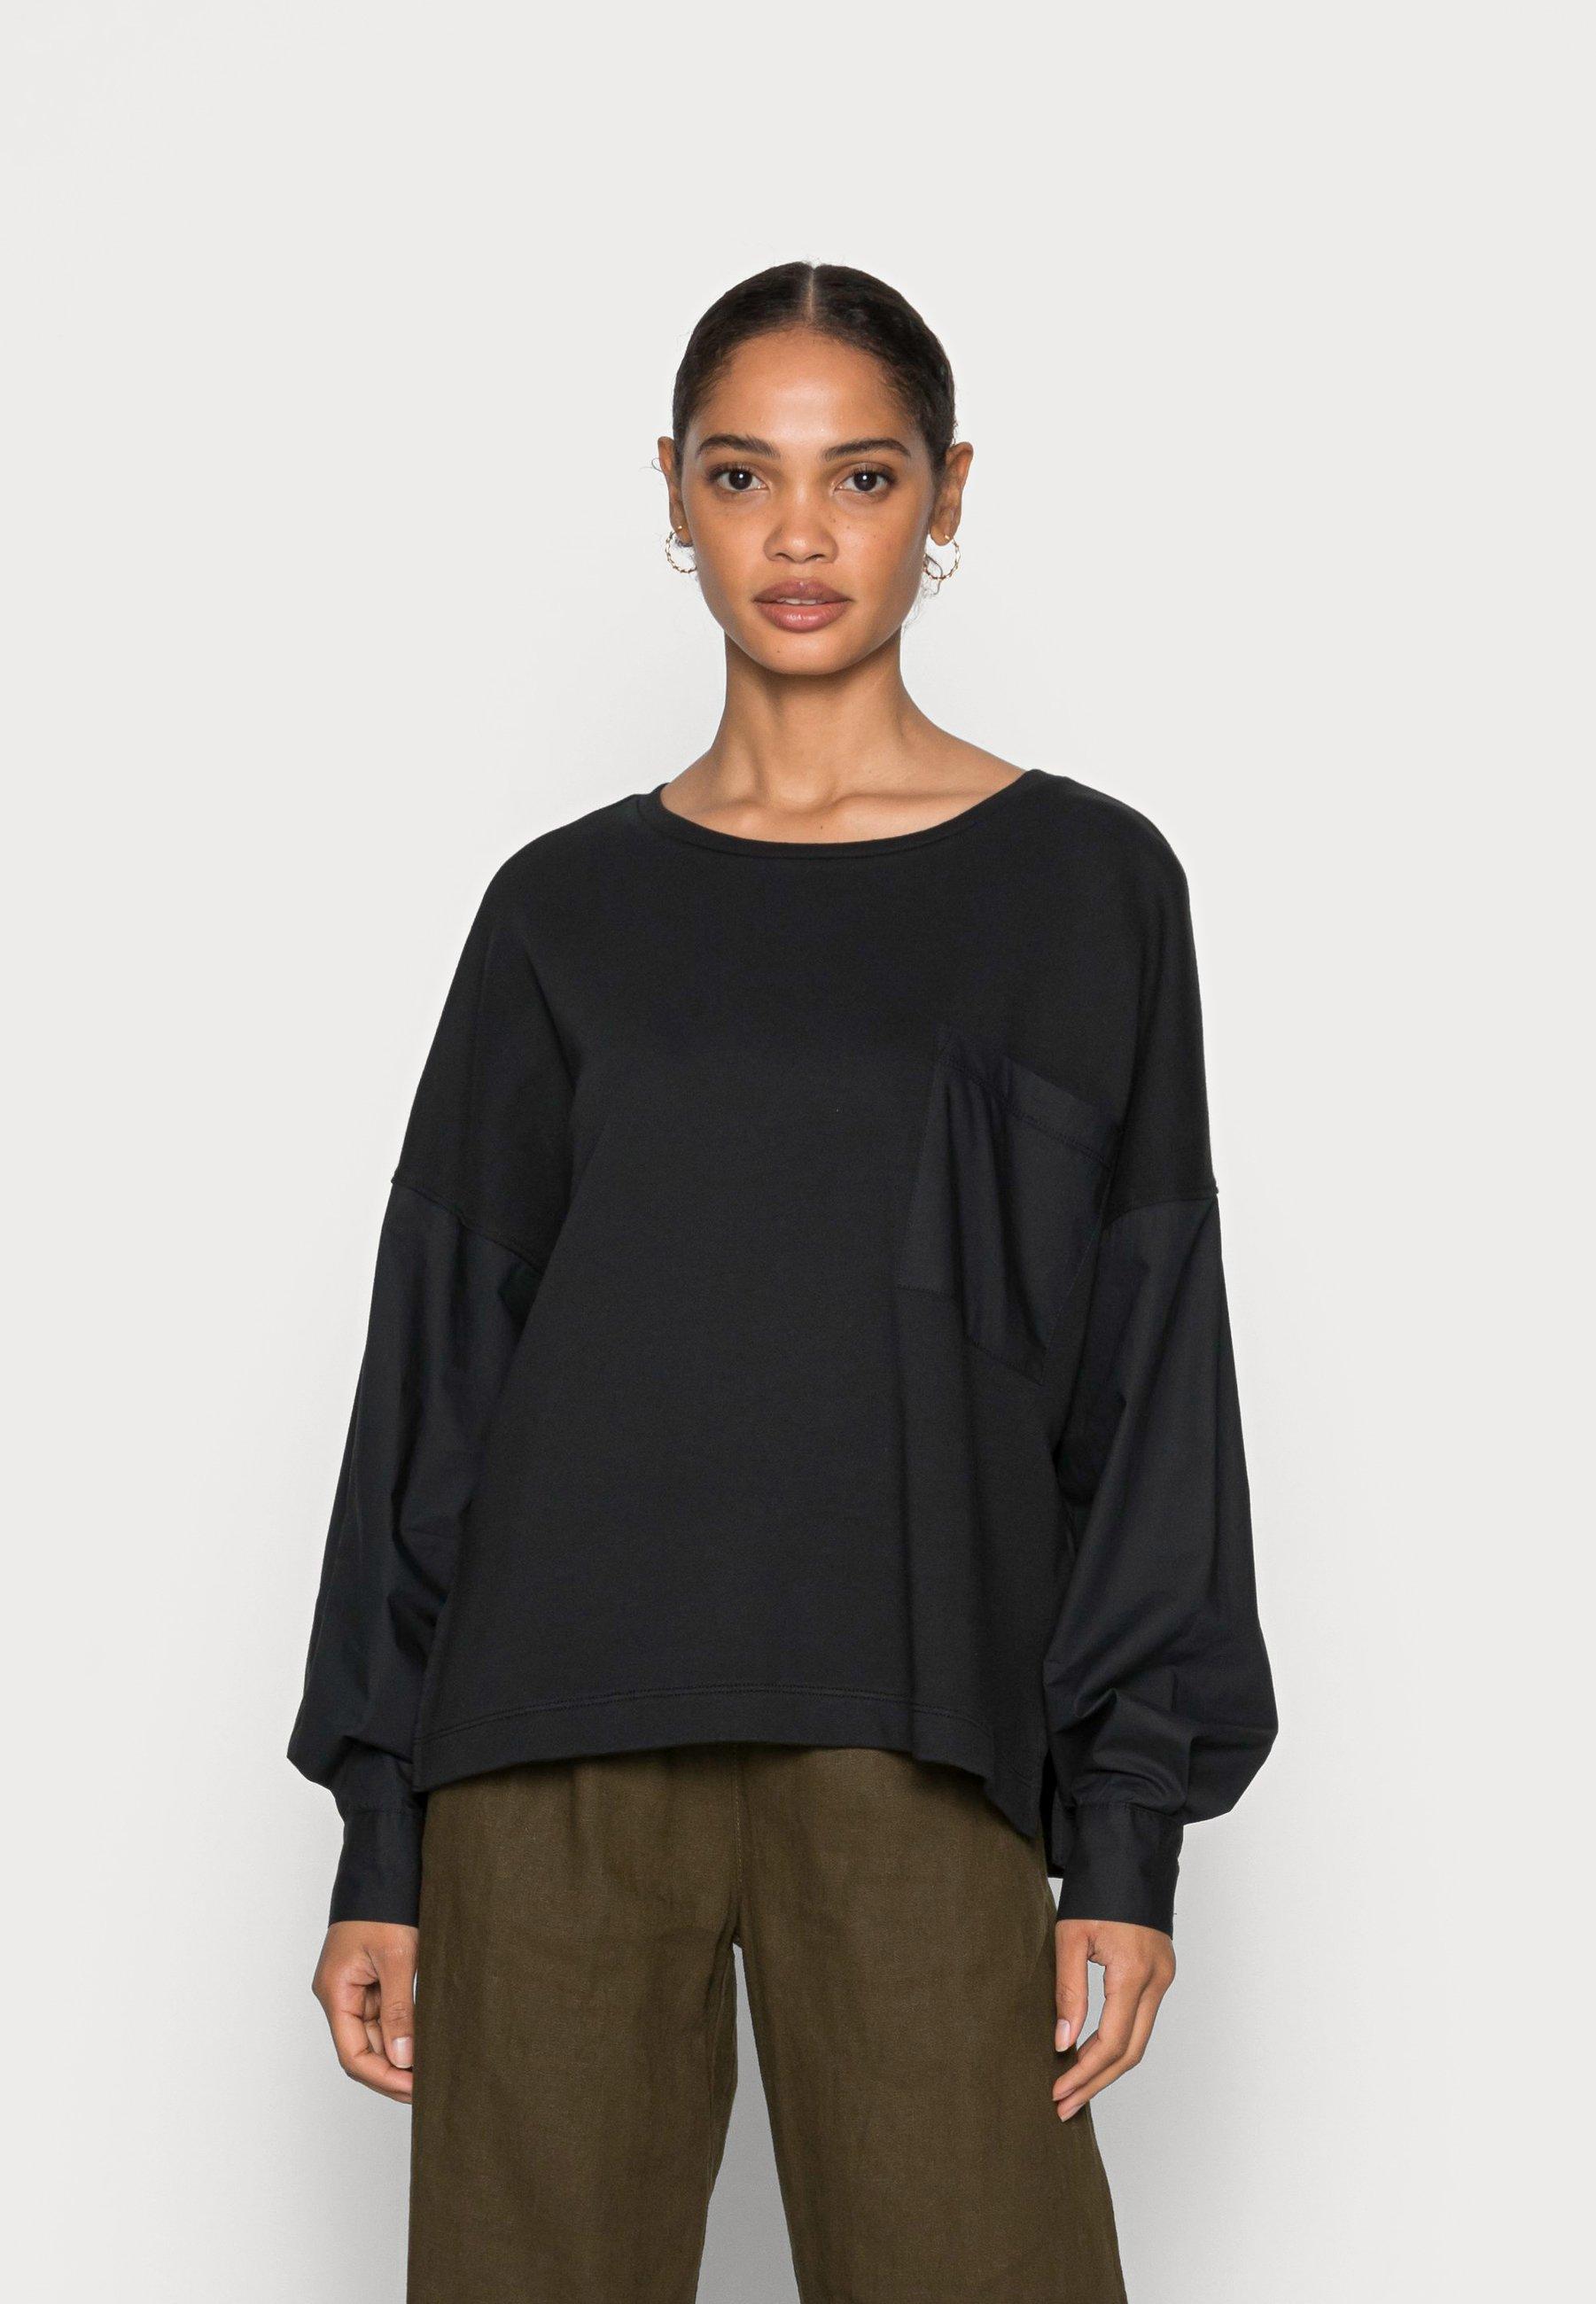 Damen LONG SLEEVE ROUND NECK PATCHED WITH WOVEN GARMEN     - Sweatshirt